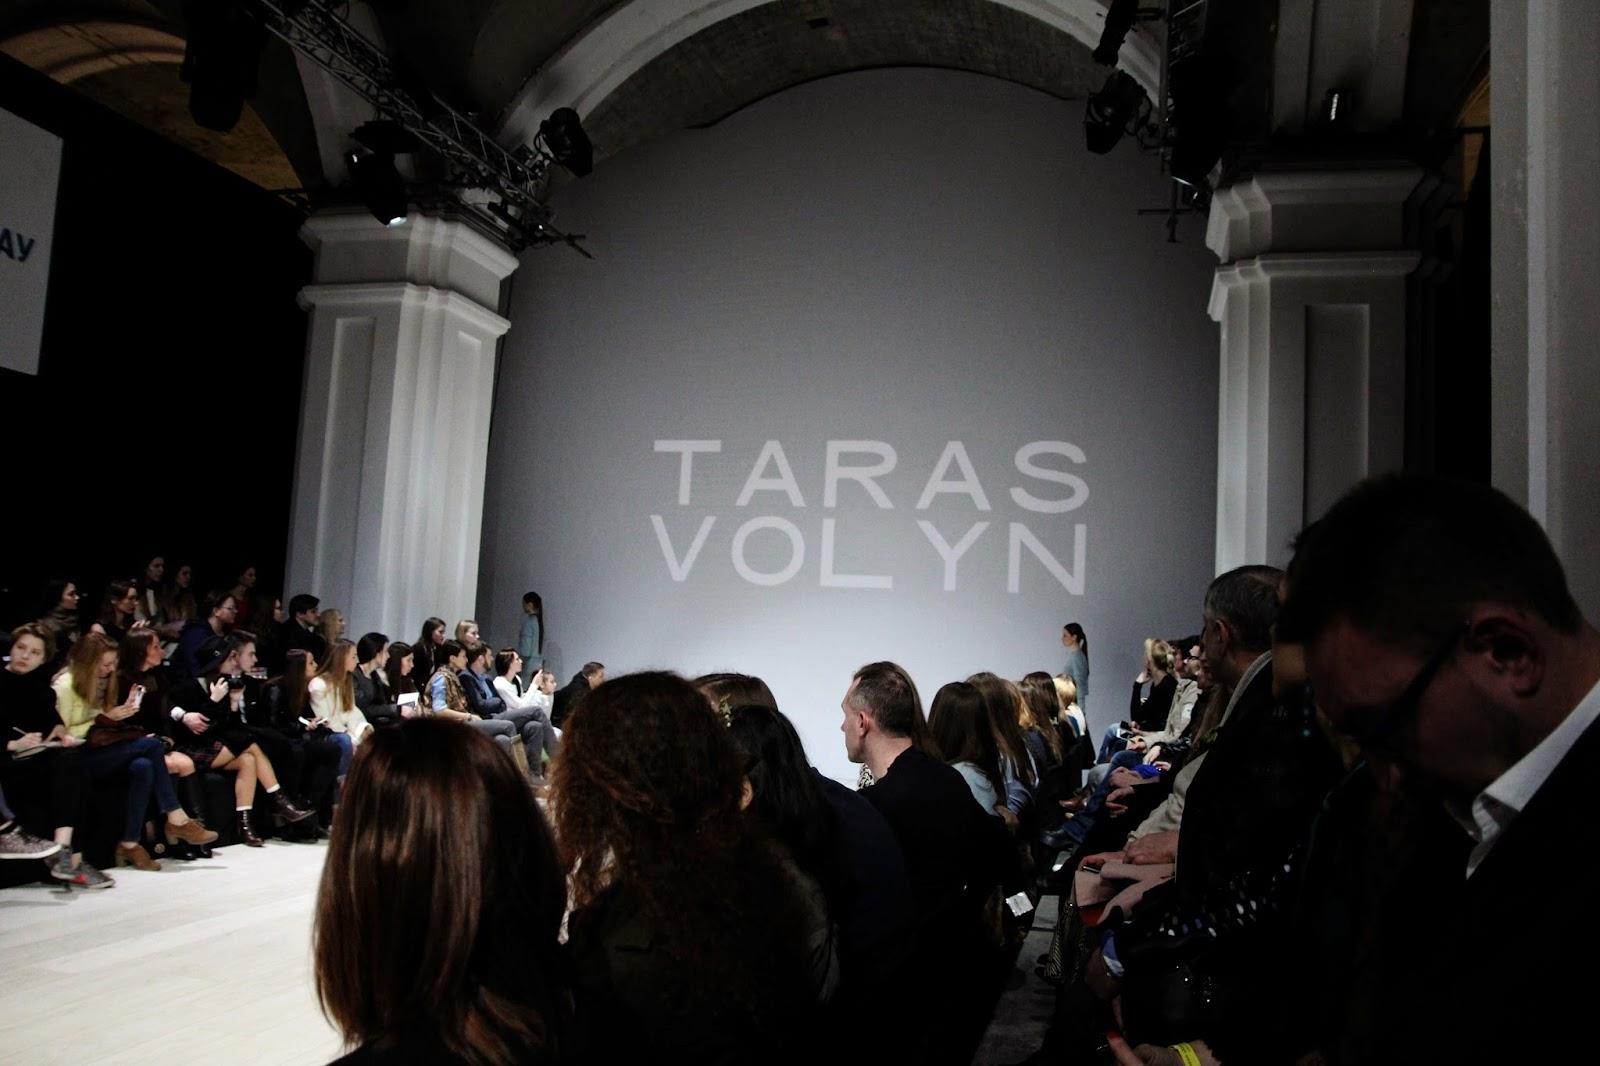 018 - Бренд Volyn by Taras Volyn -  постоянный участник Dnepr Fashion Weekend.